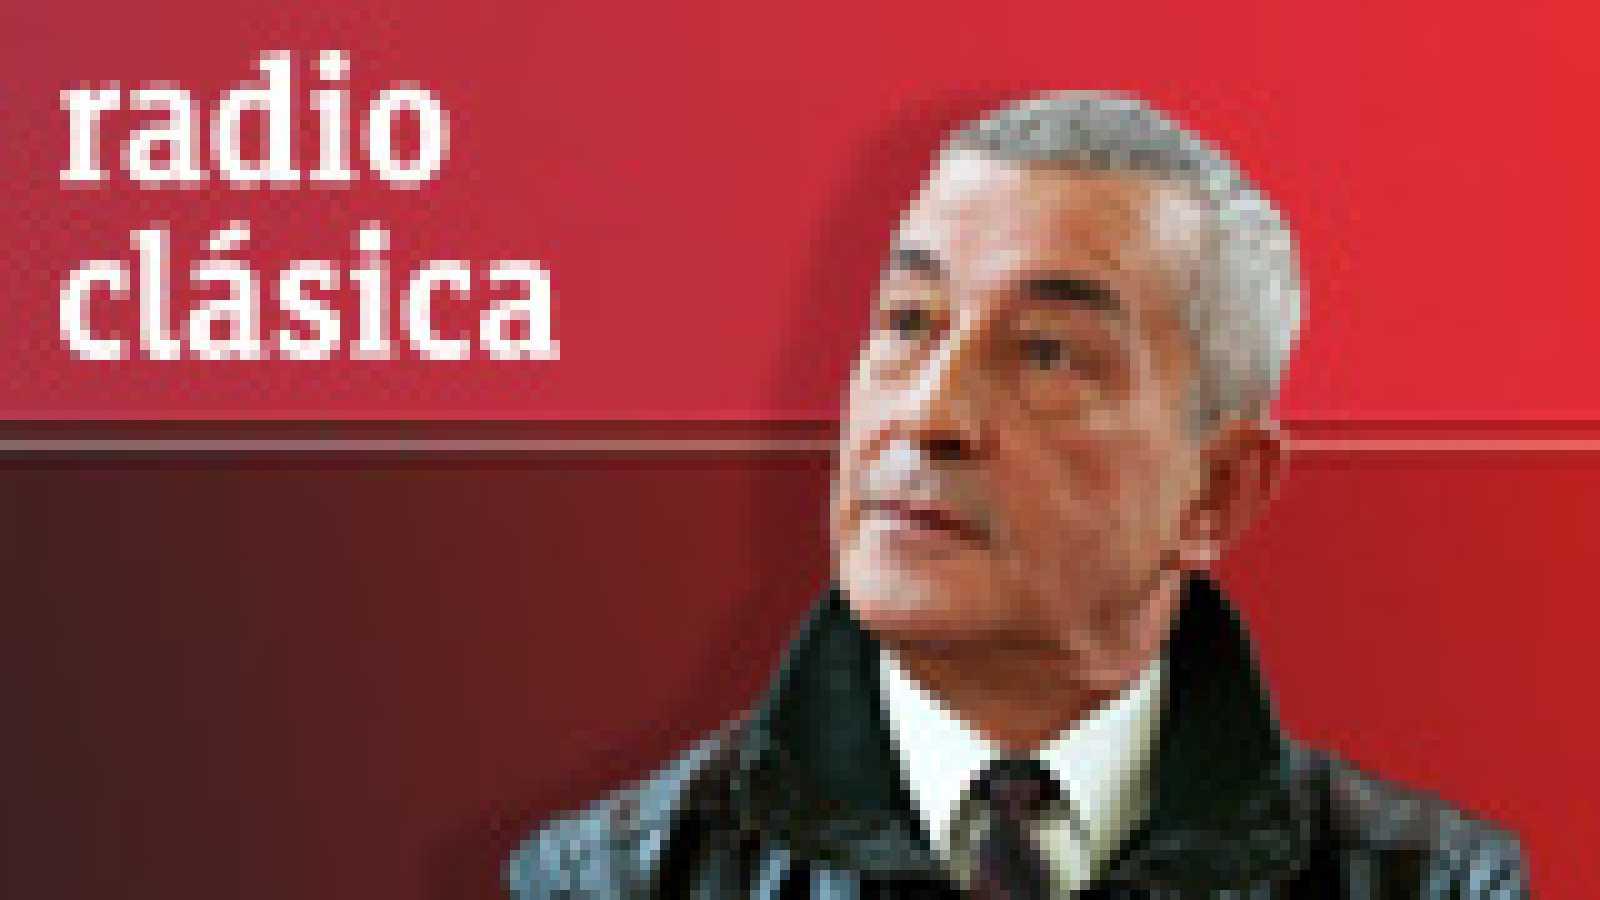 Vía límite : c ulturas Sonoras - spanishrevolution - 31/05/11 - Escuchar ahora